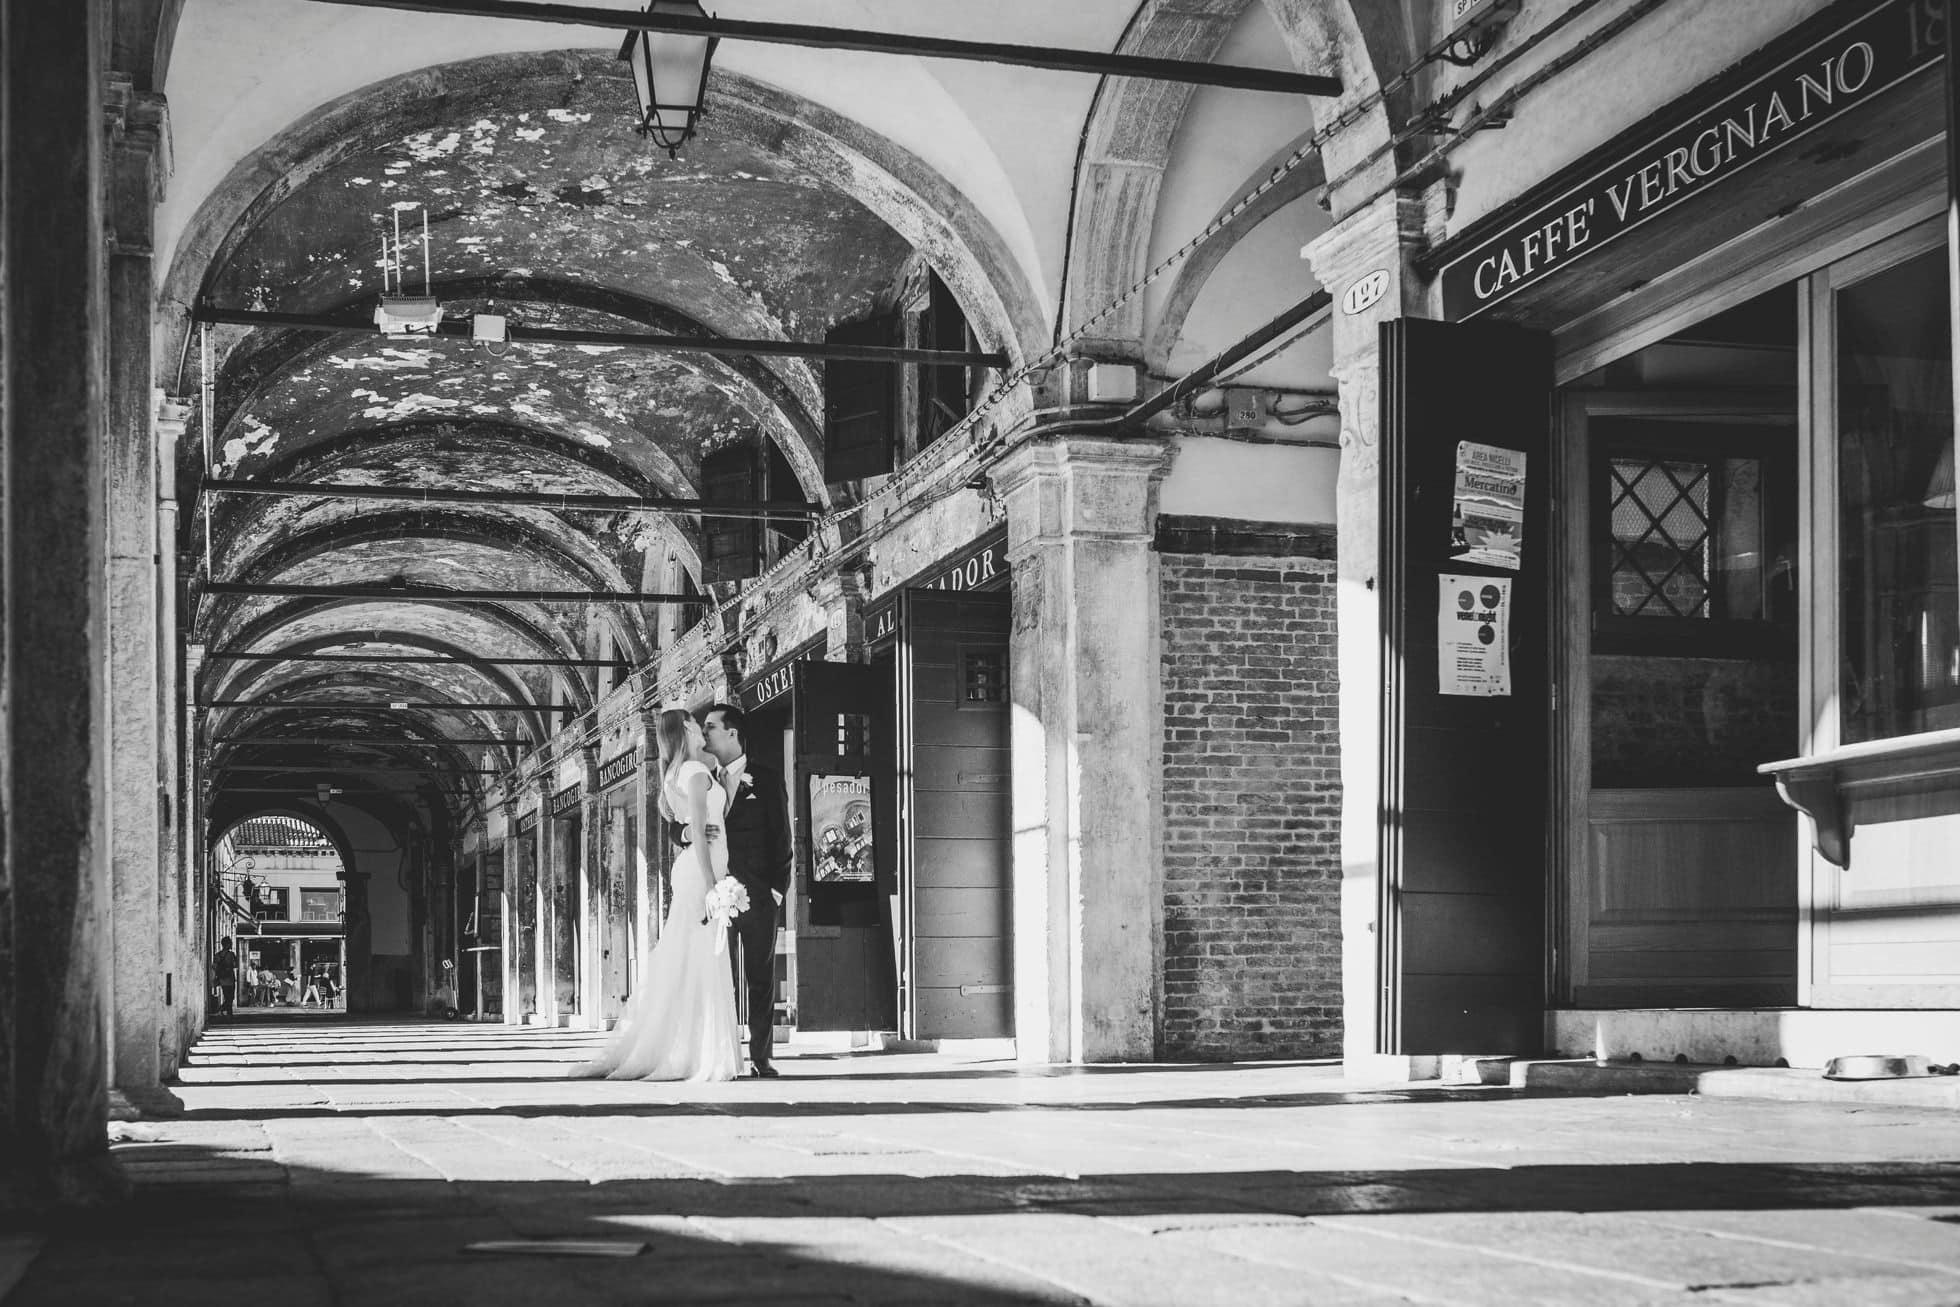 fotografo matrimonio comune venezia